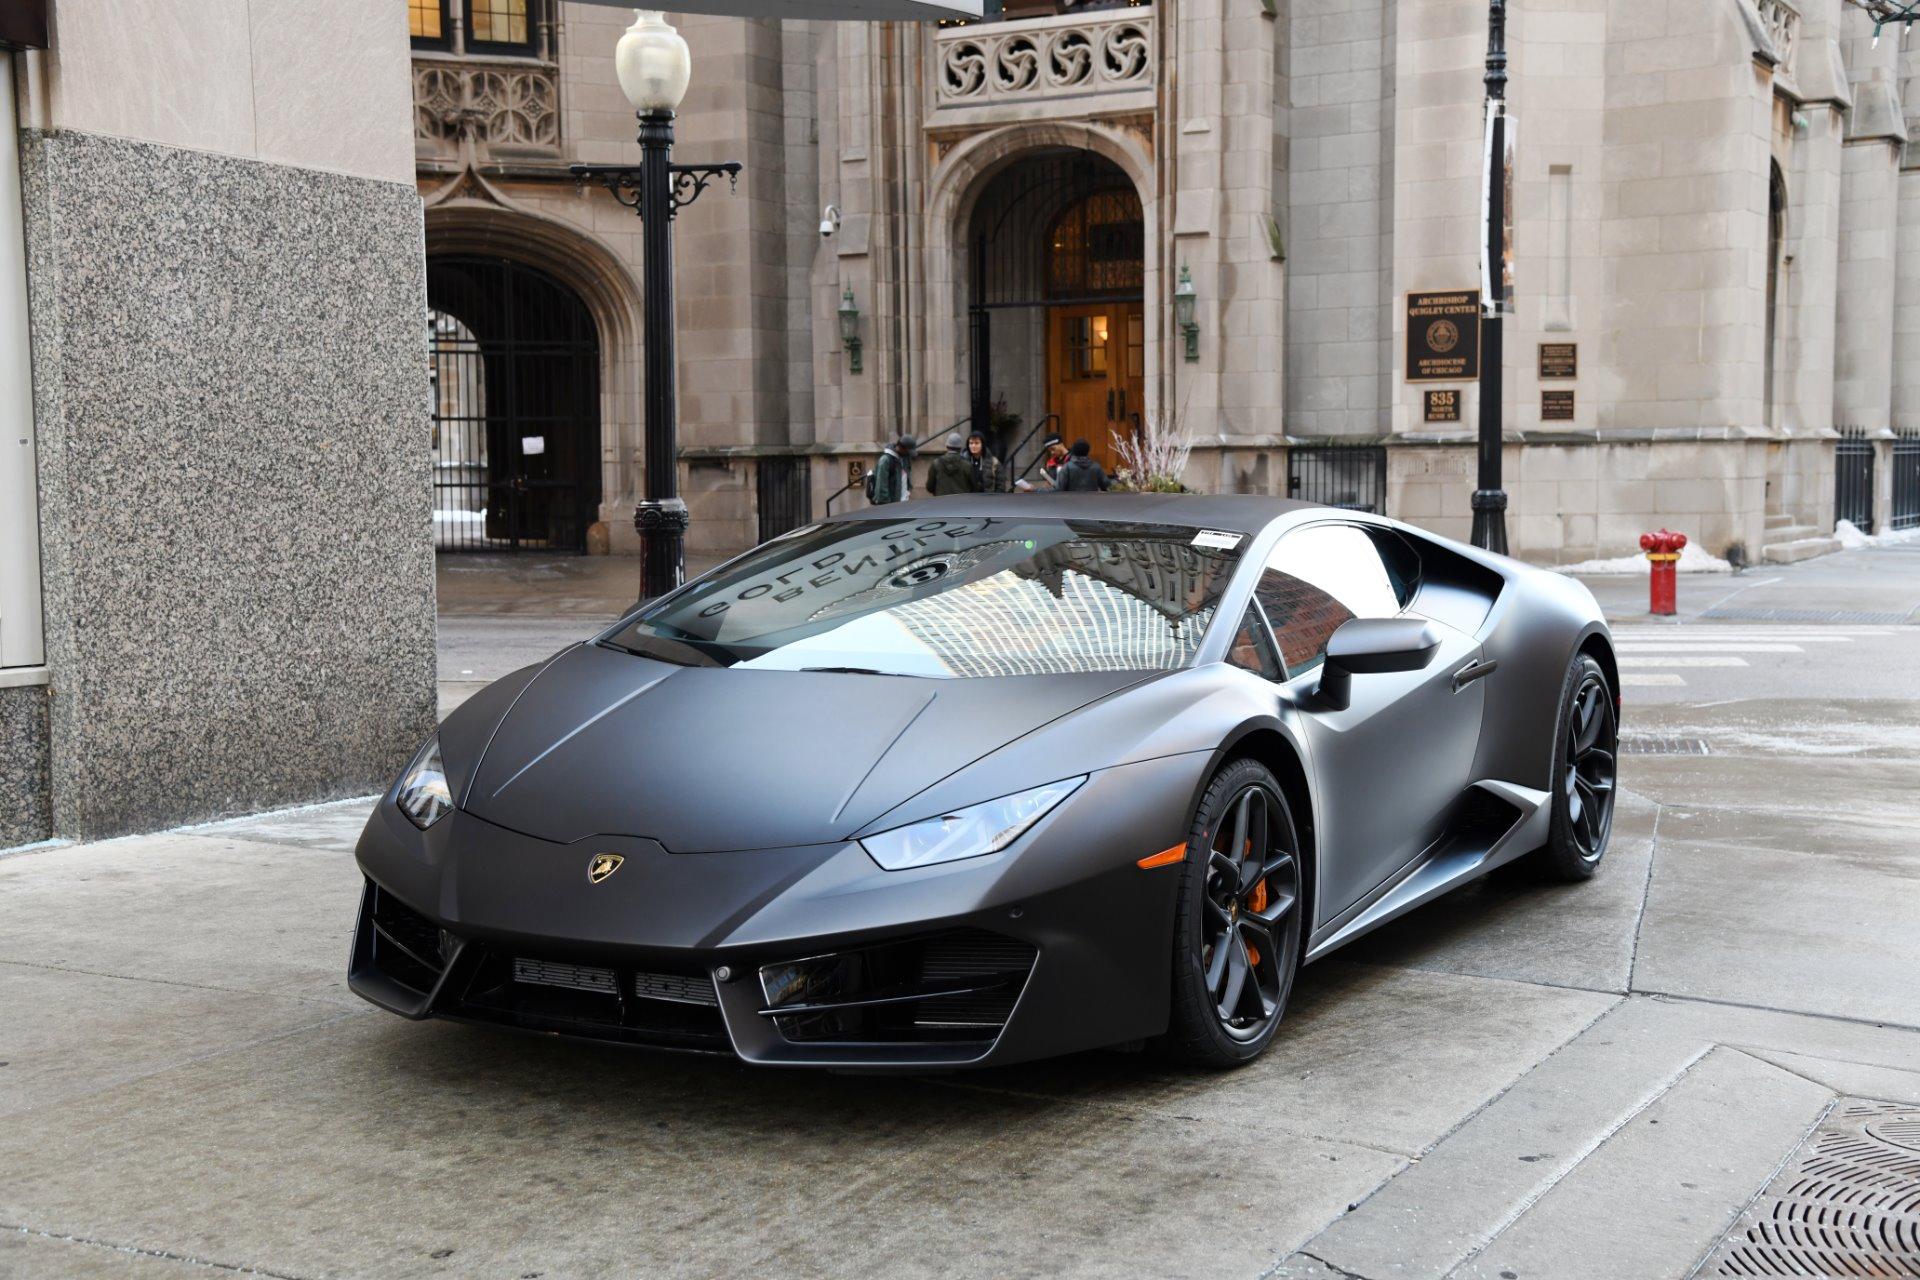 2018 Lamborghini Huracan Lp 580 2 Stock L426 For Sale